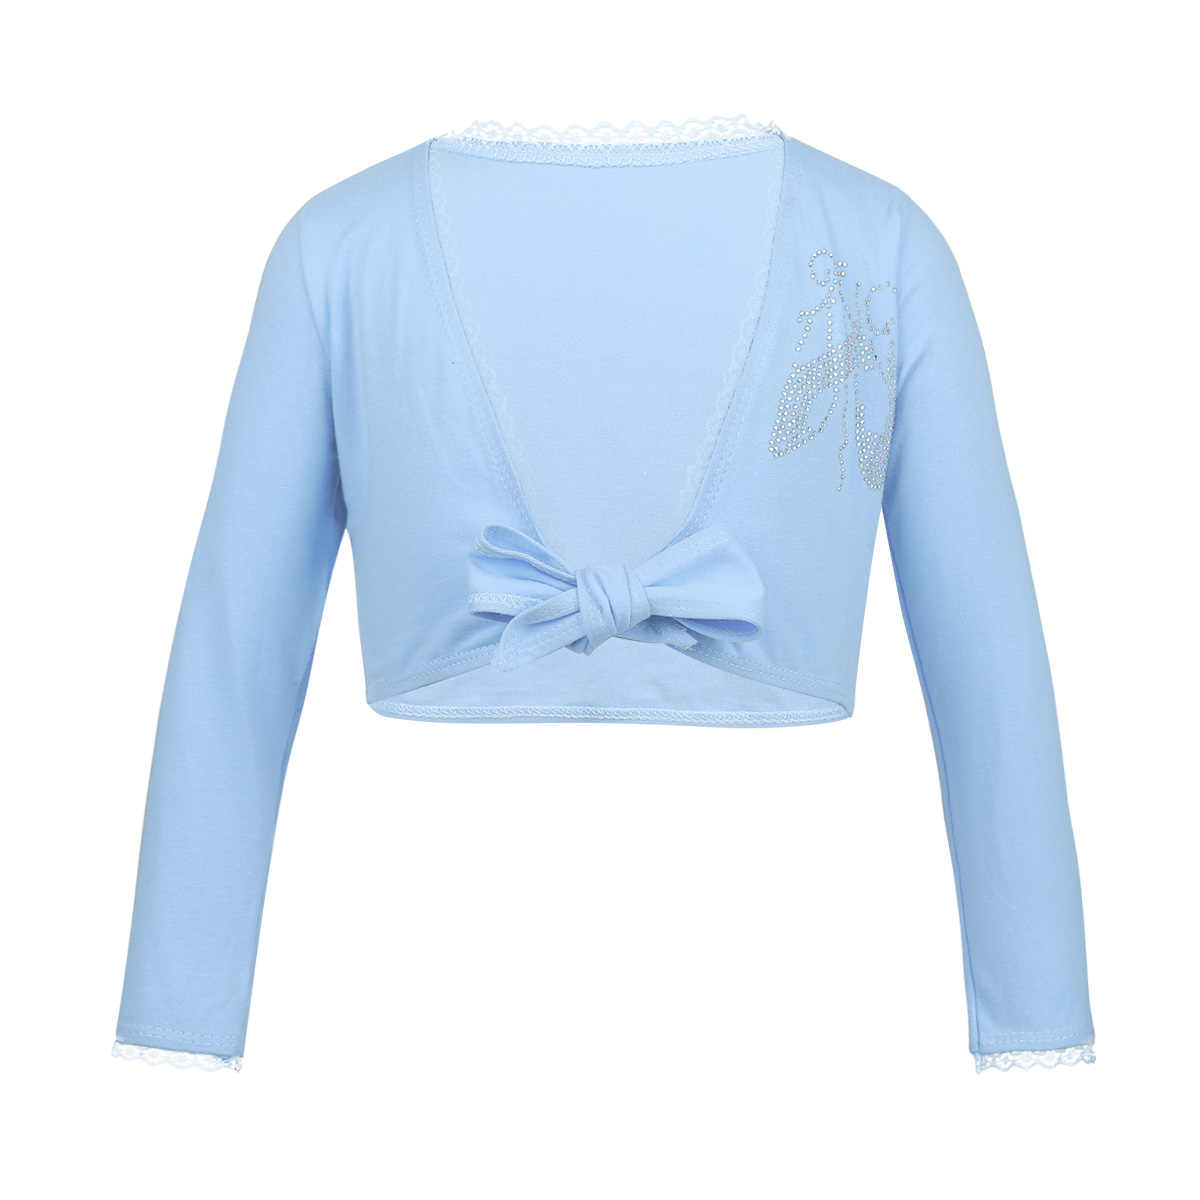 1dfddf74a ... Girls Long Sleeve Dance Costume Crop Tops Girl Bow Lace Ballet Leotard  Shrug Wrap Top Cardigan ...